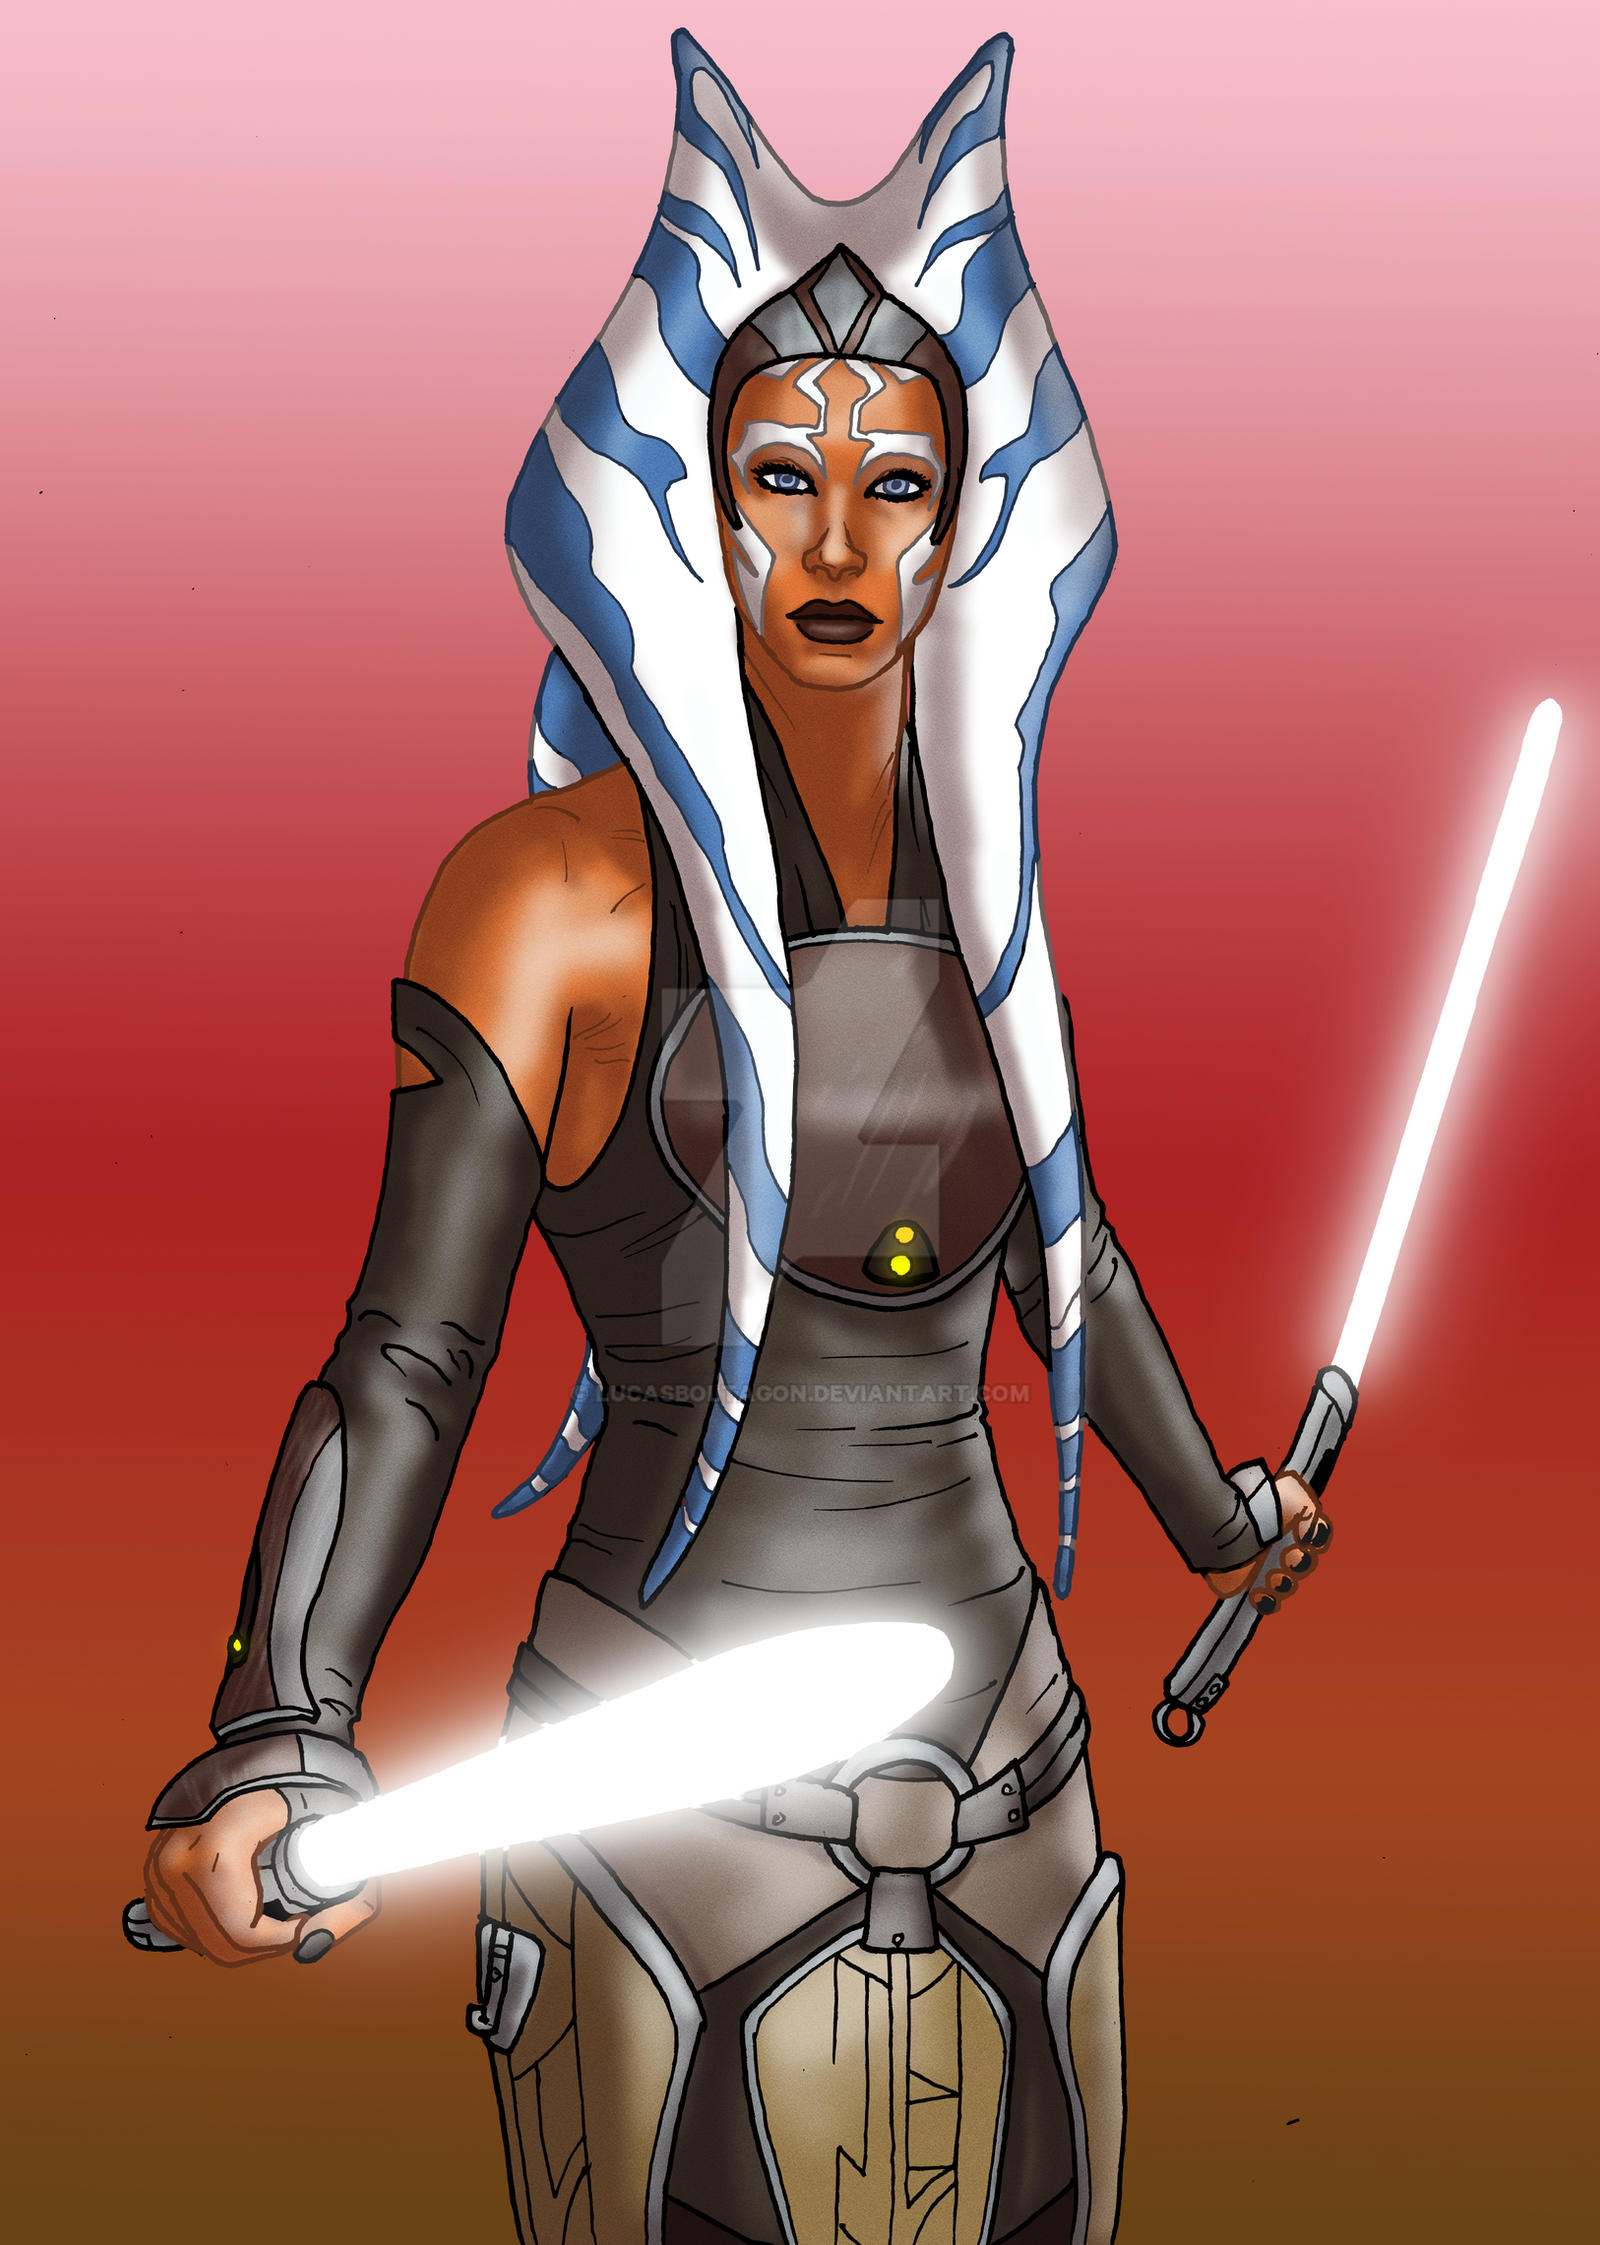 Star Wars Rebels - Ahsoka Tano by ViiPerArt on DeviantArt